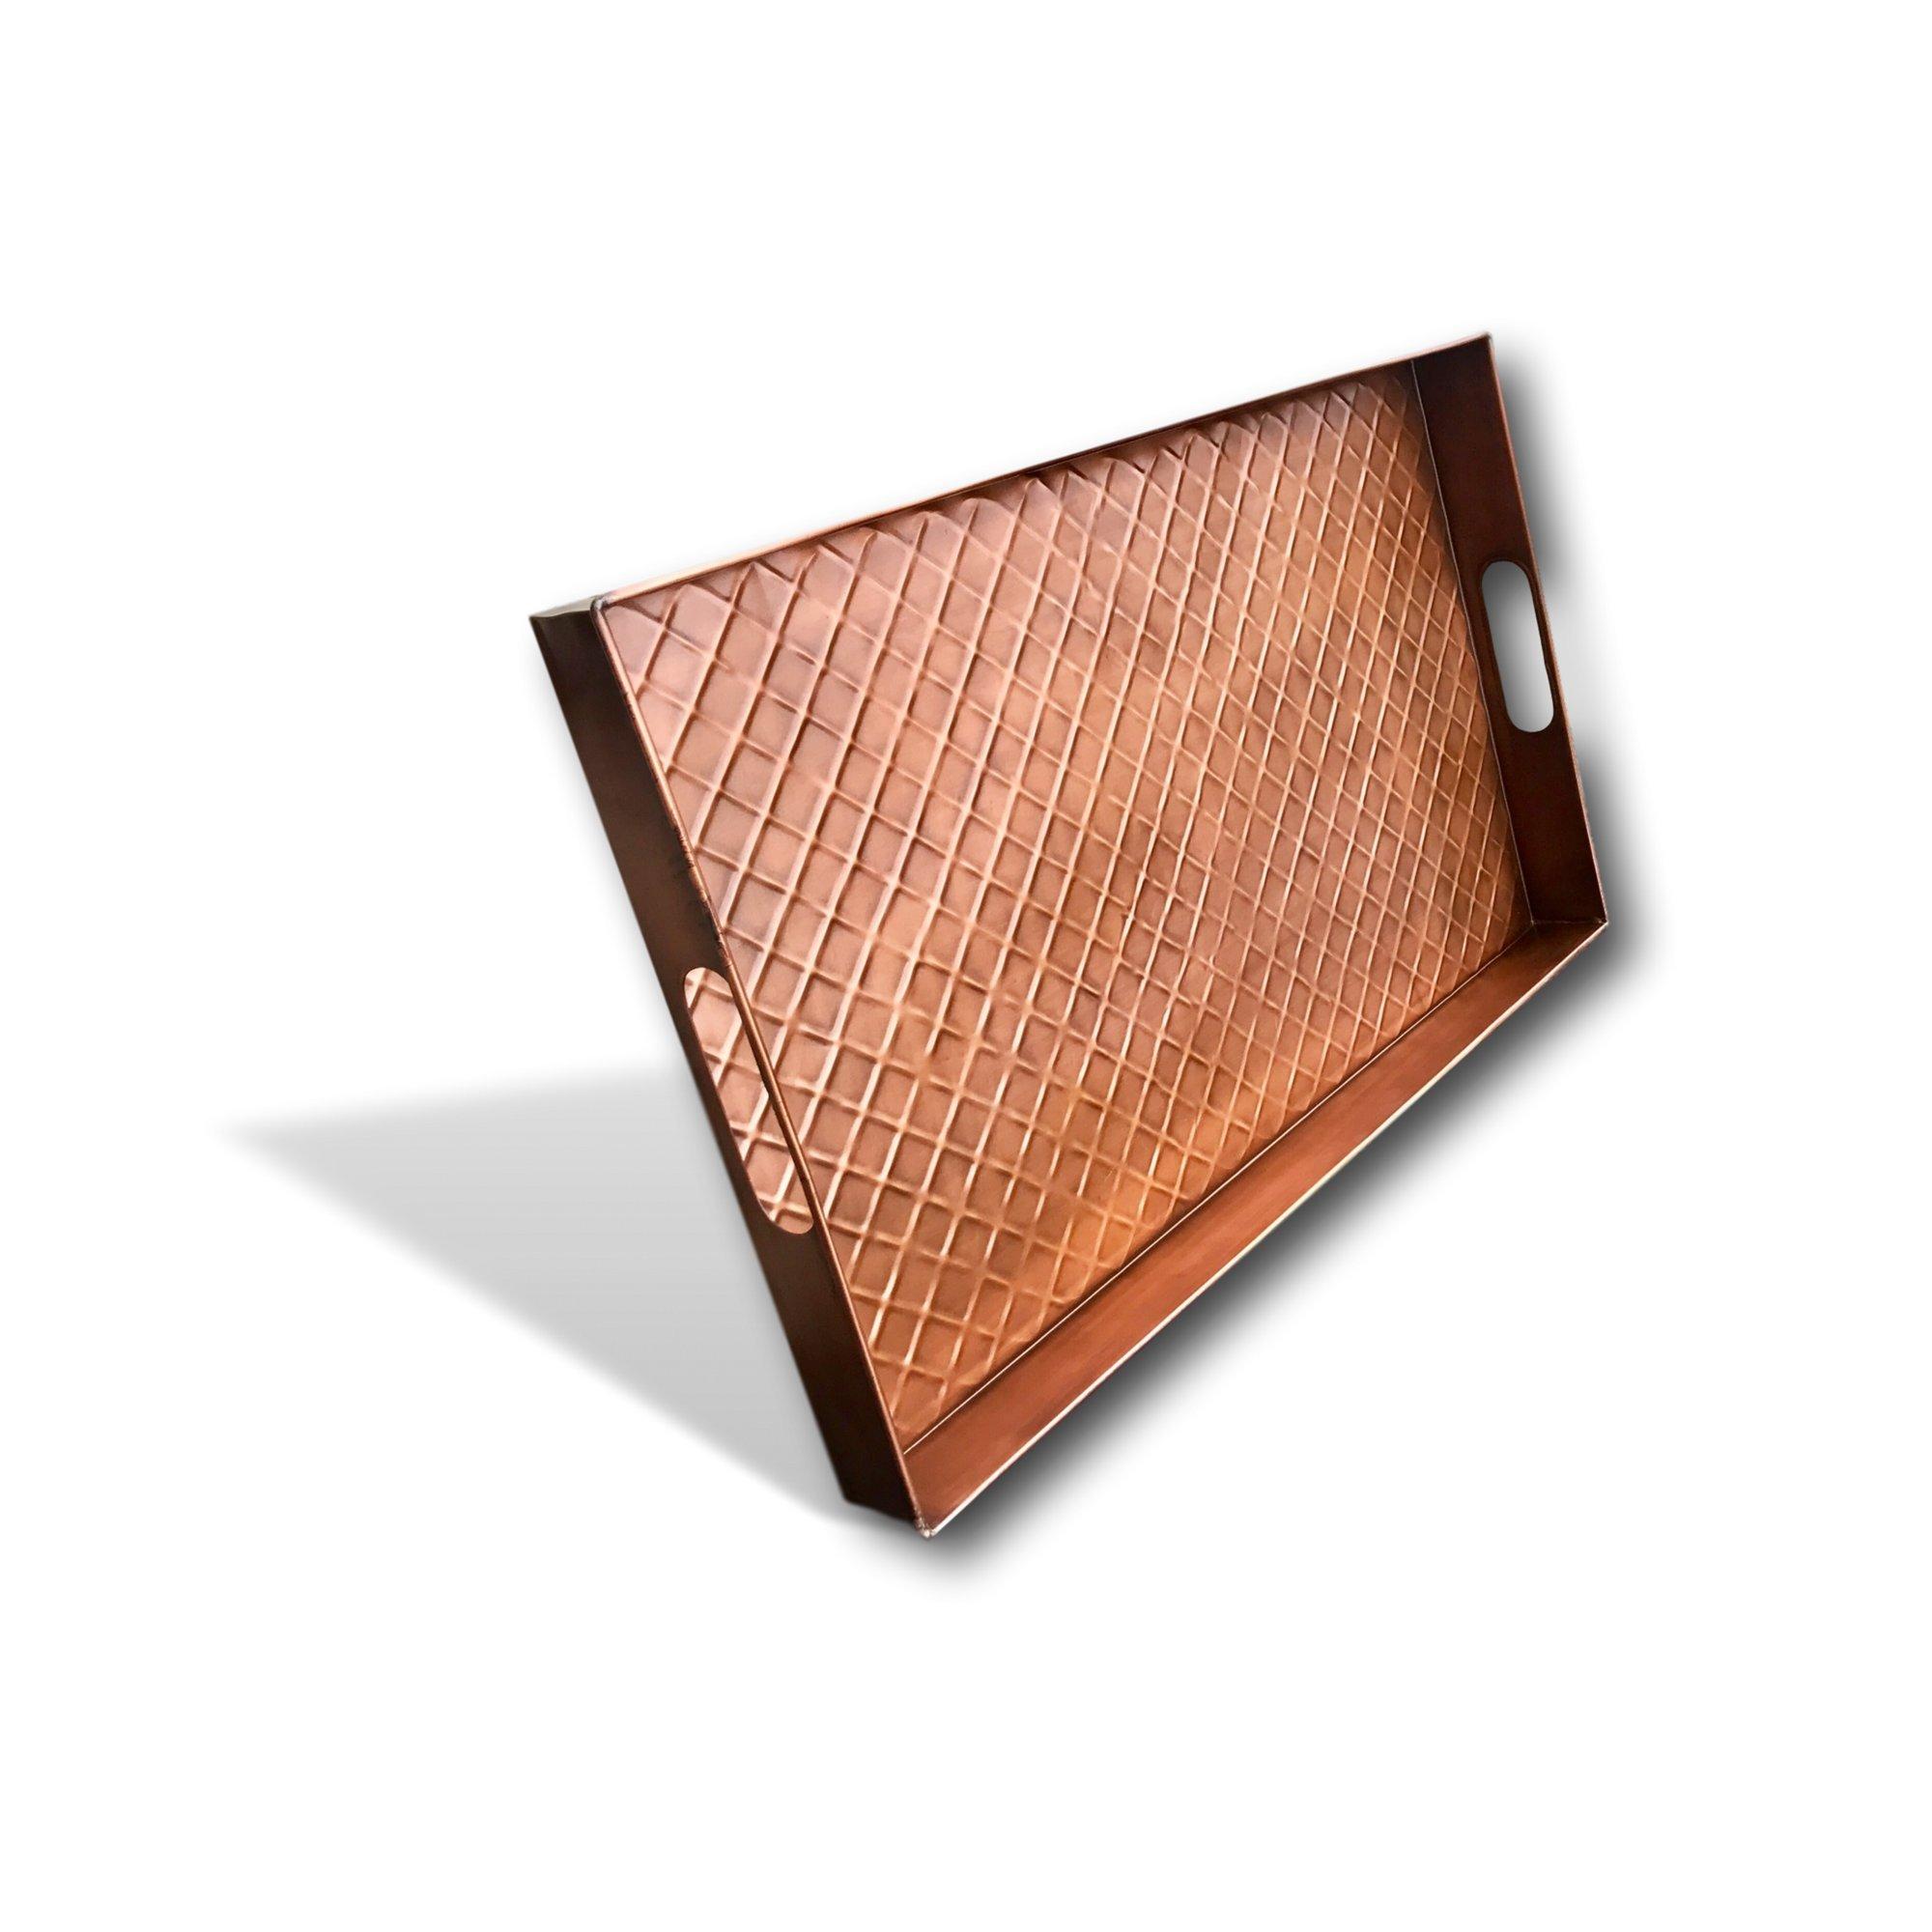 Kauri Multi-Purpose Diamond Large Boot and Shoe Tray | Metal Copper 24'' Boot Tray Design